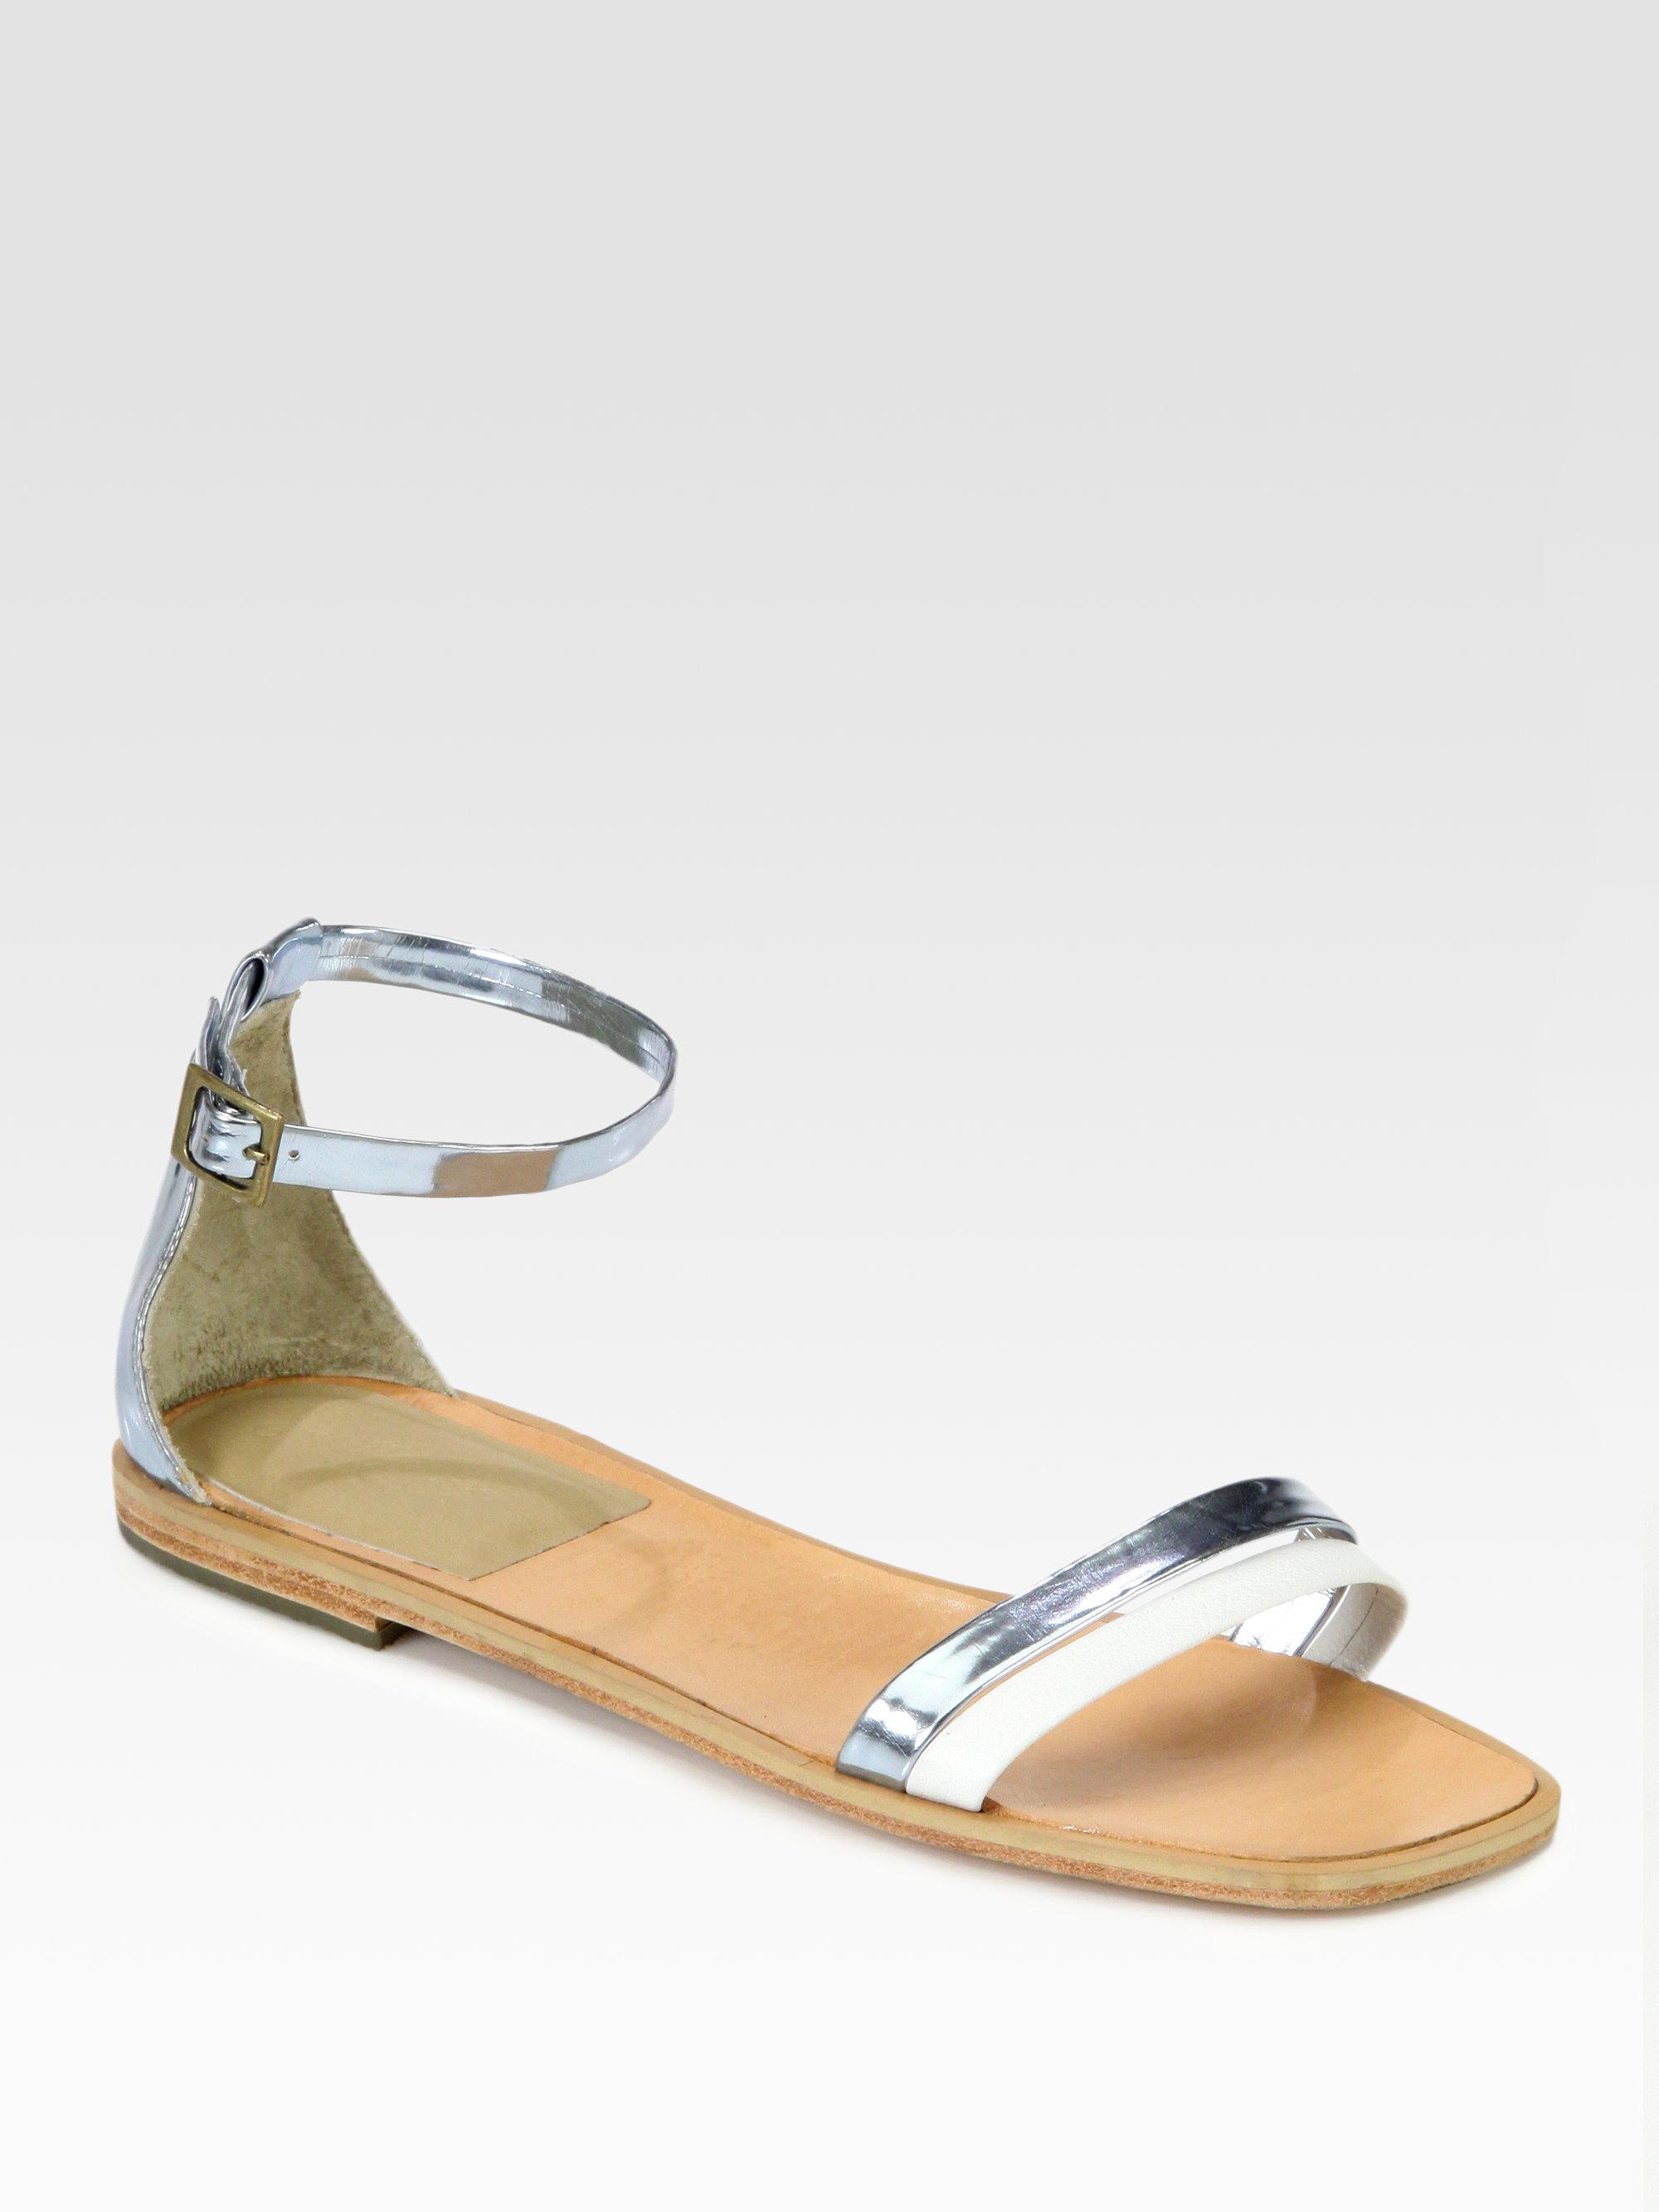 Rachel Comey Metallic Ankle Strap Sandals cheap sale 2014 newest outlet locations sale online cheap discount buy cheap factory outlet MFURwaeUW